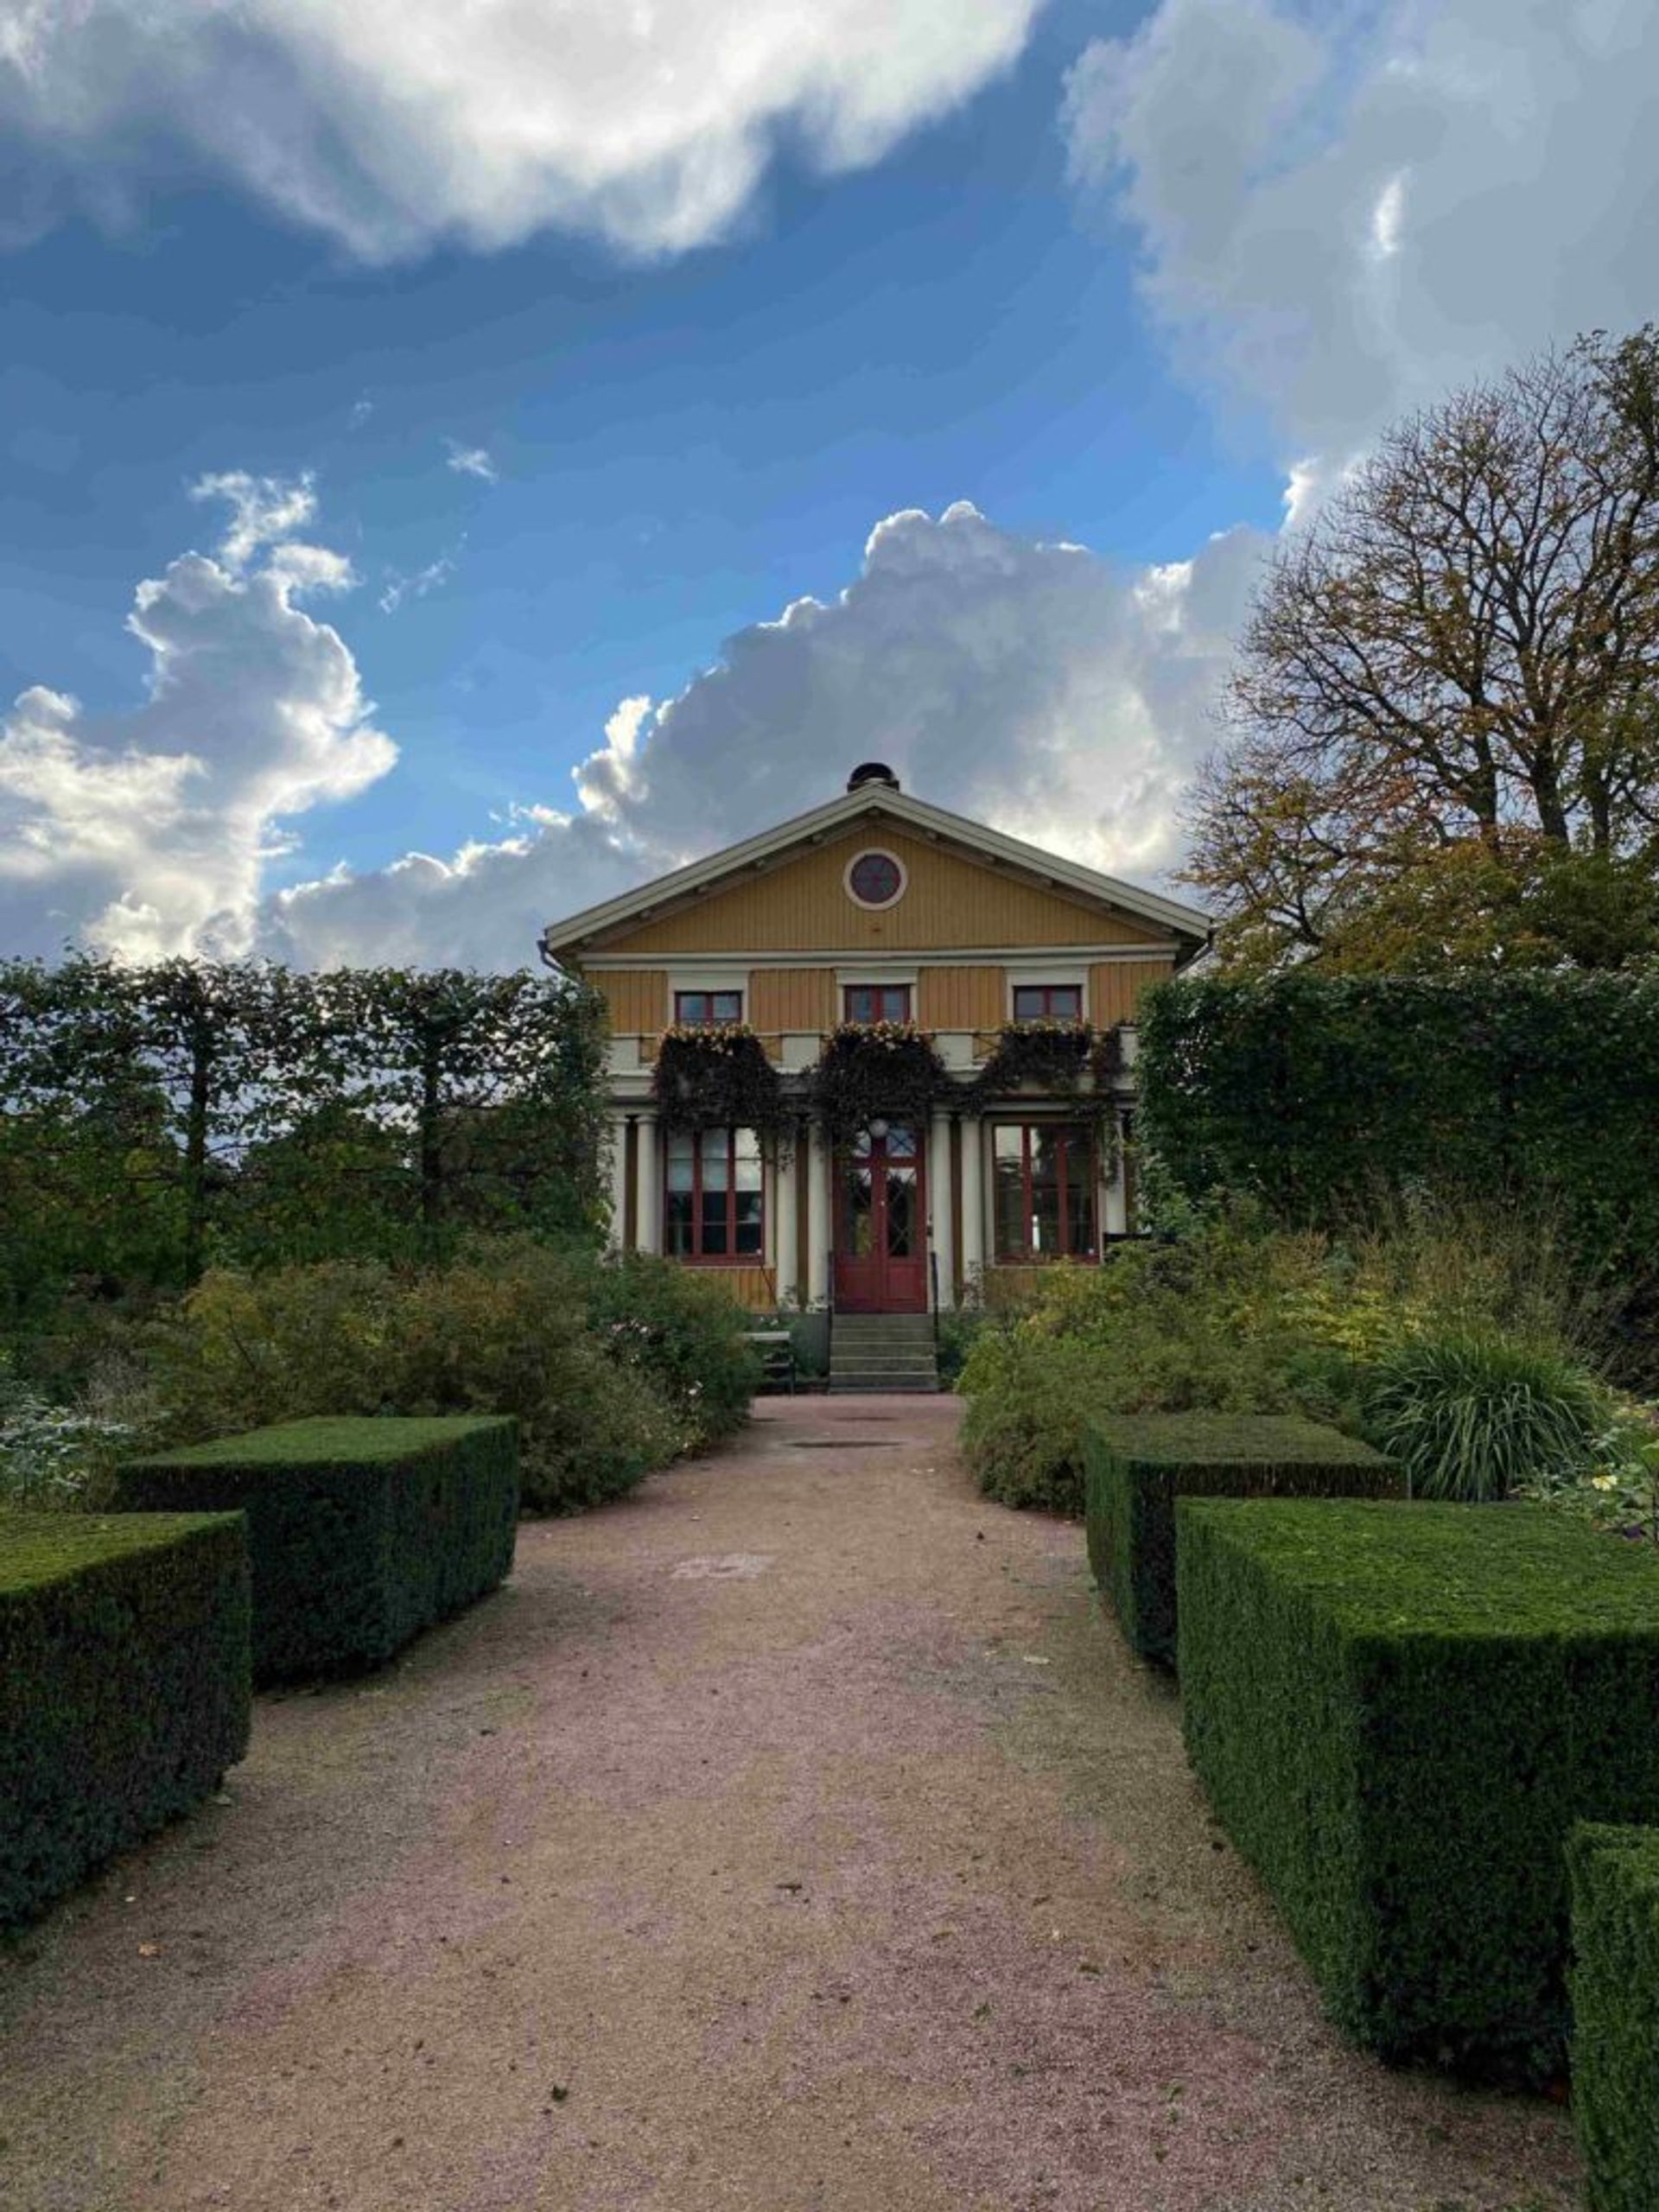 A yellow wooden house in Gothenburg's botanical gardens.